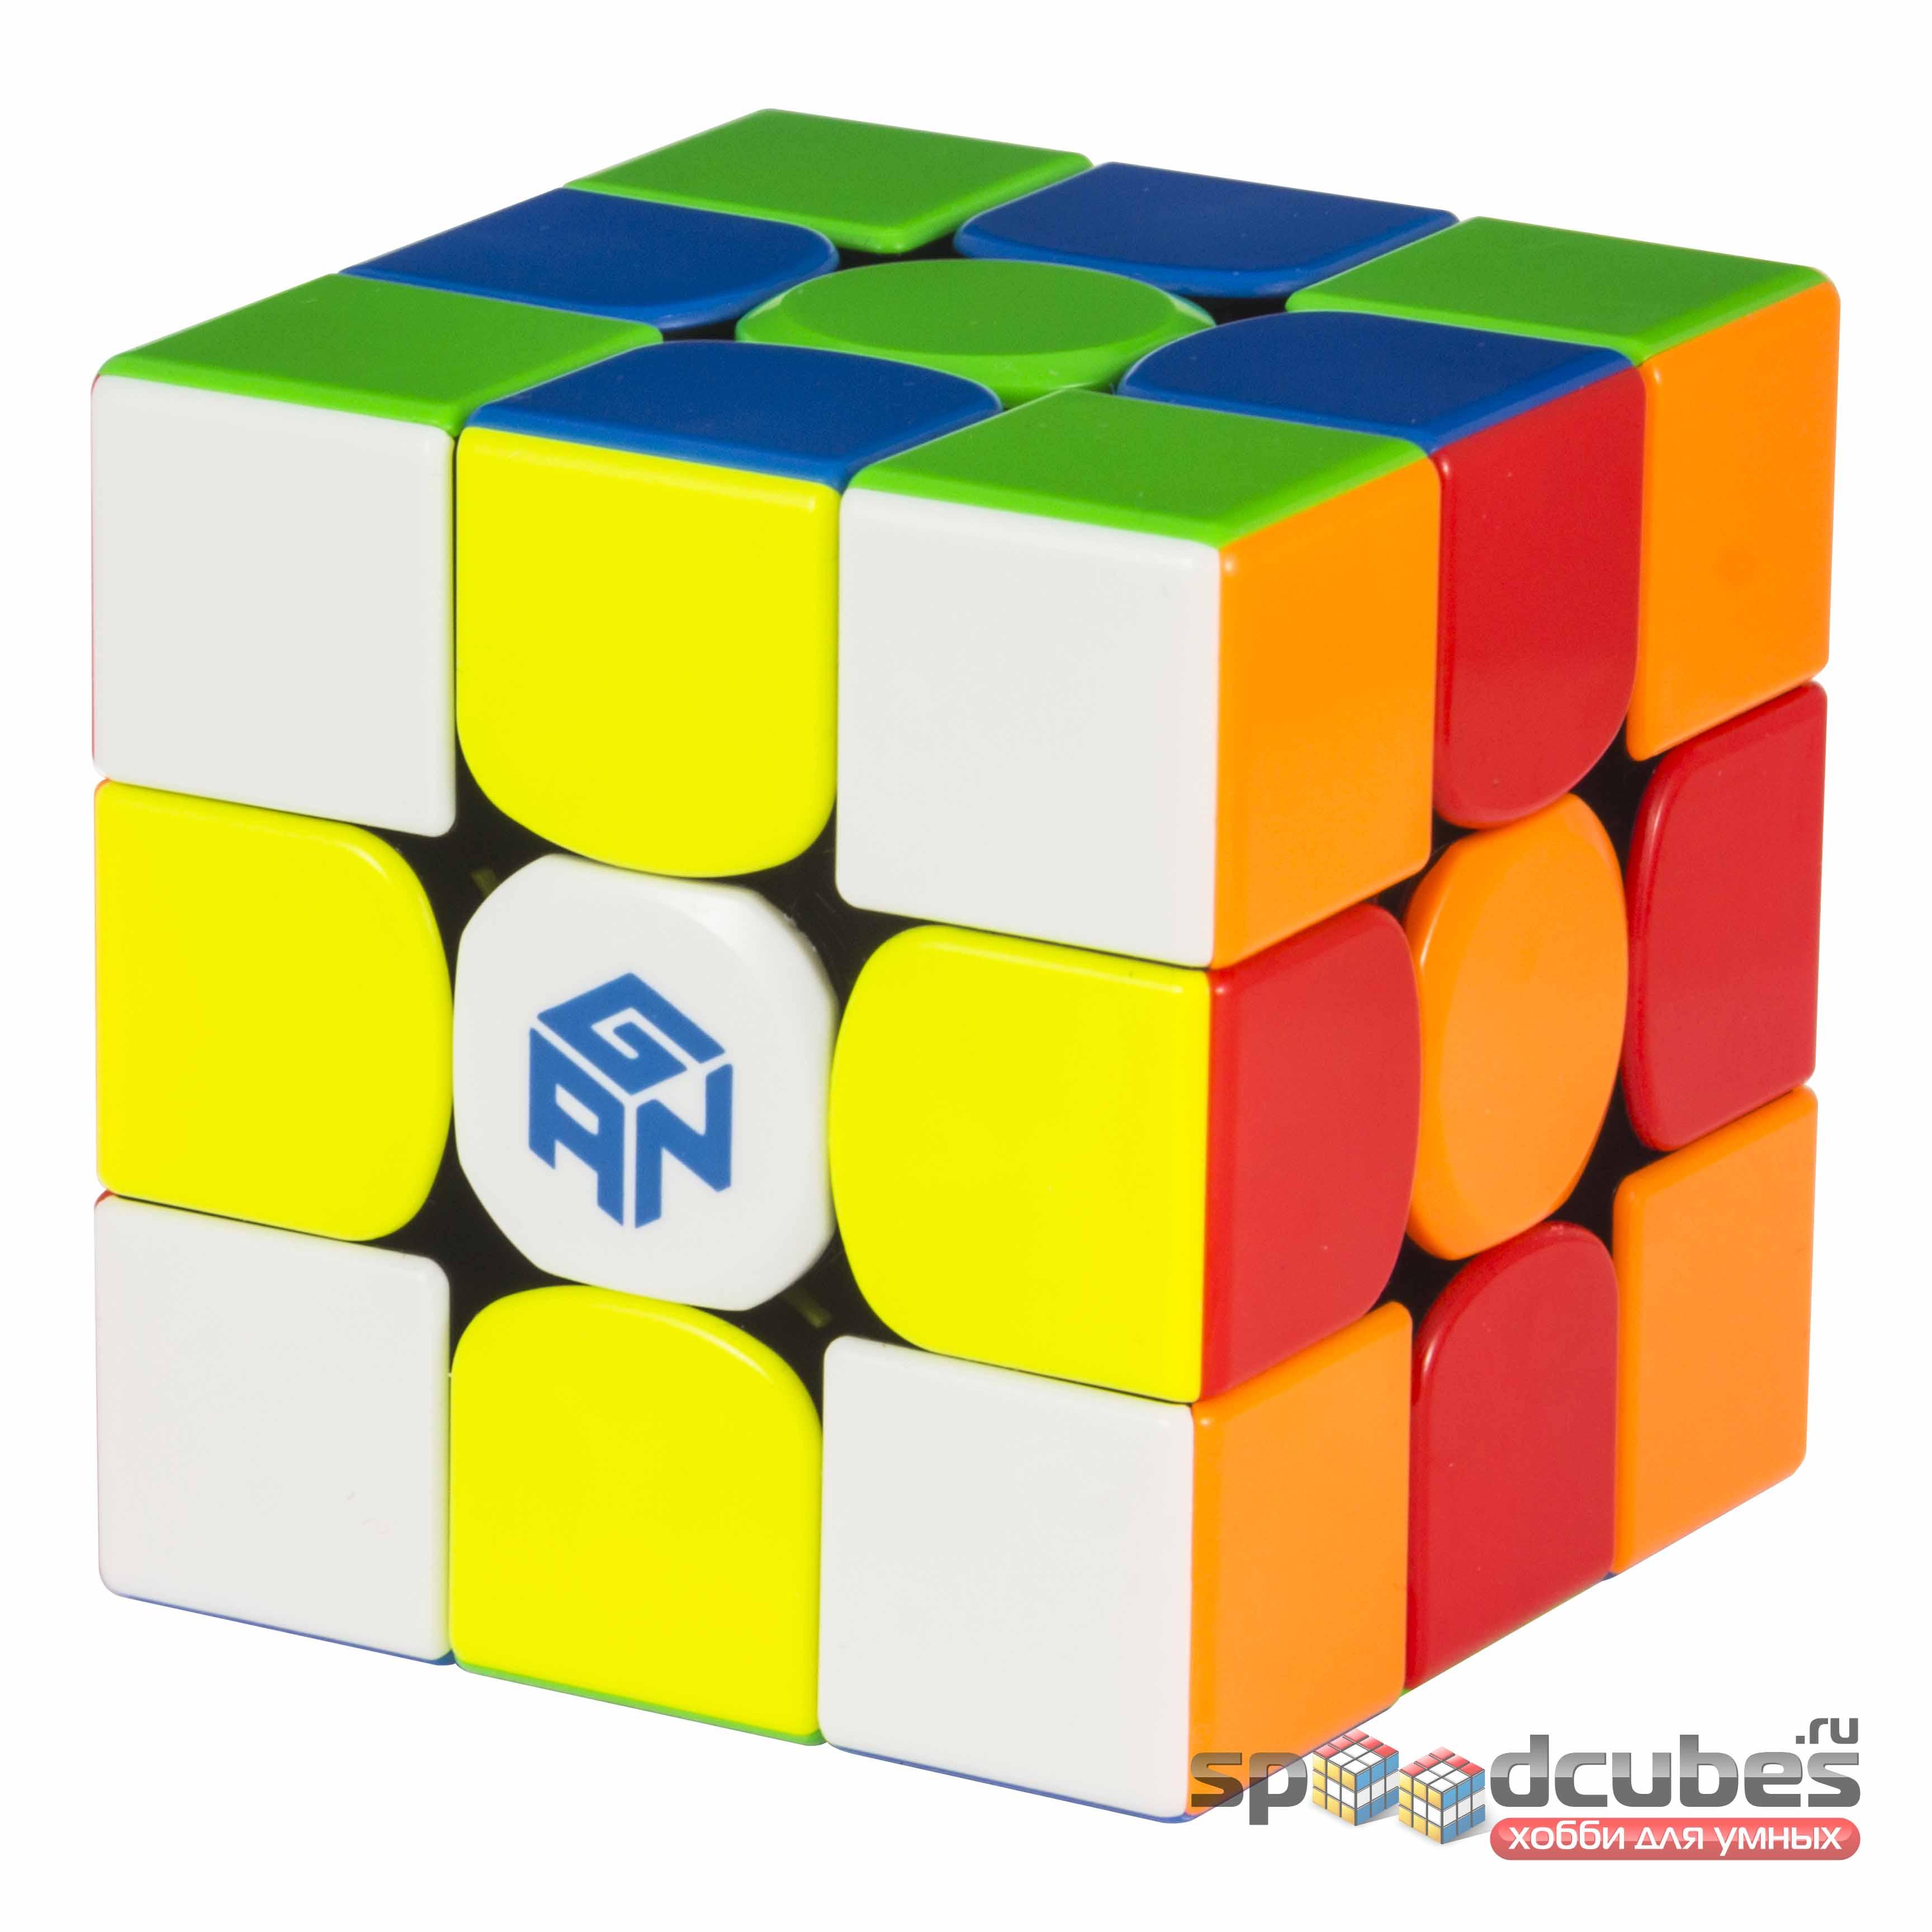 Gan 356x Numerical Color 3